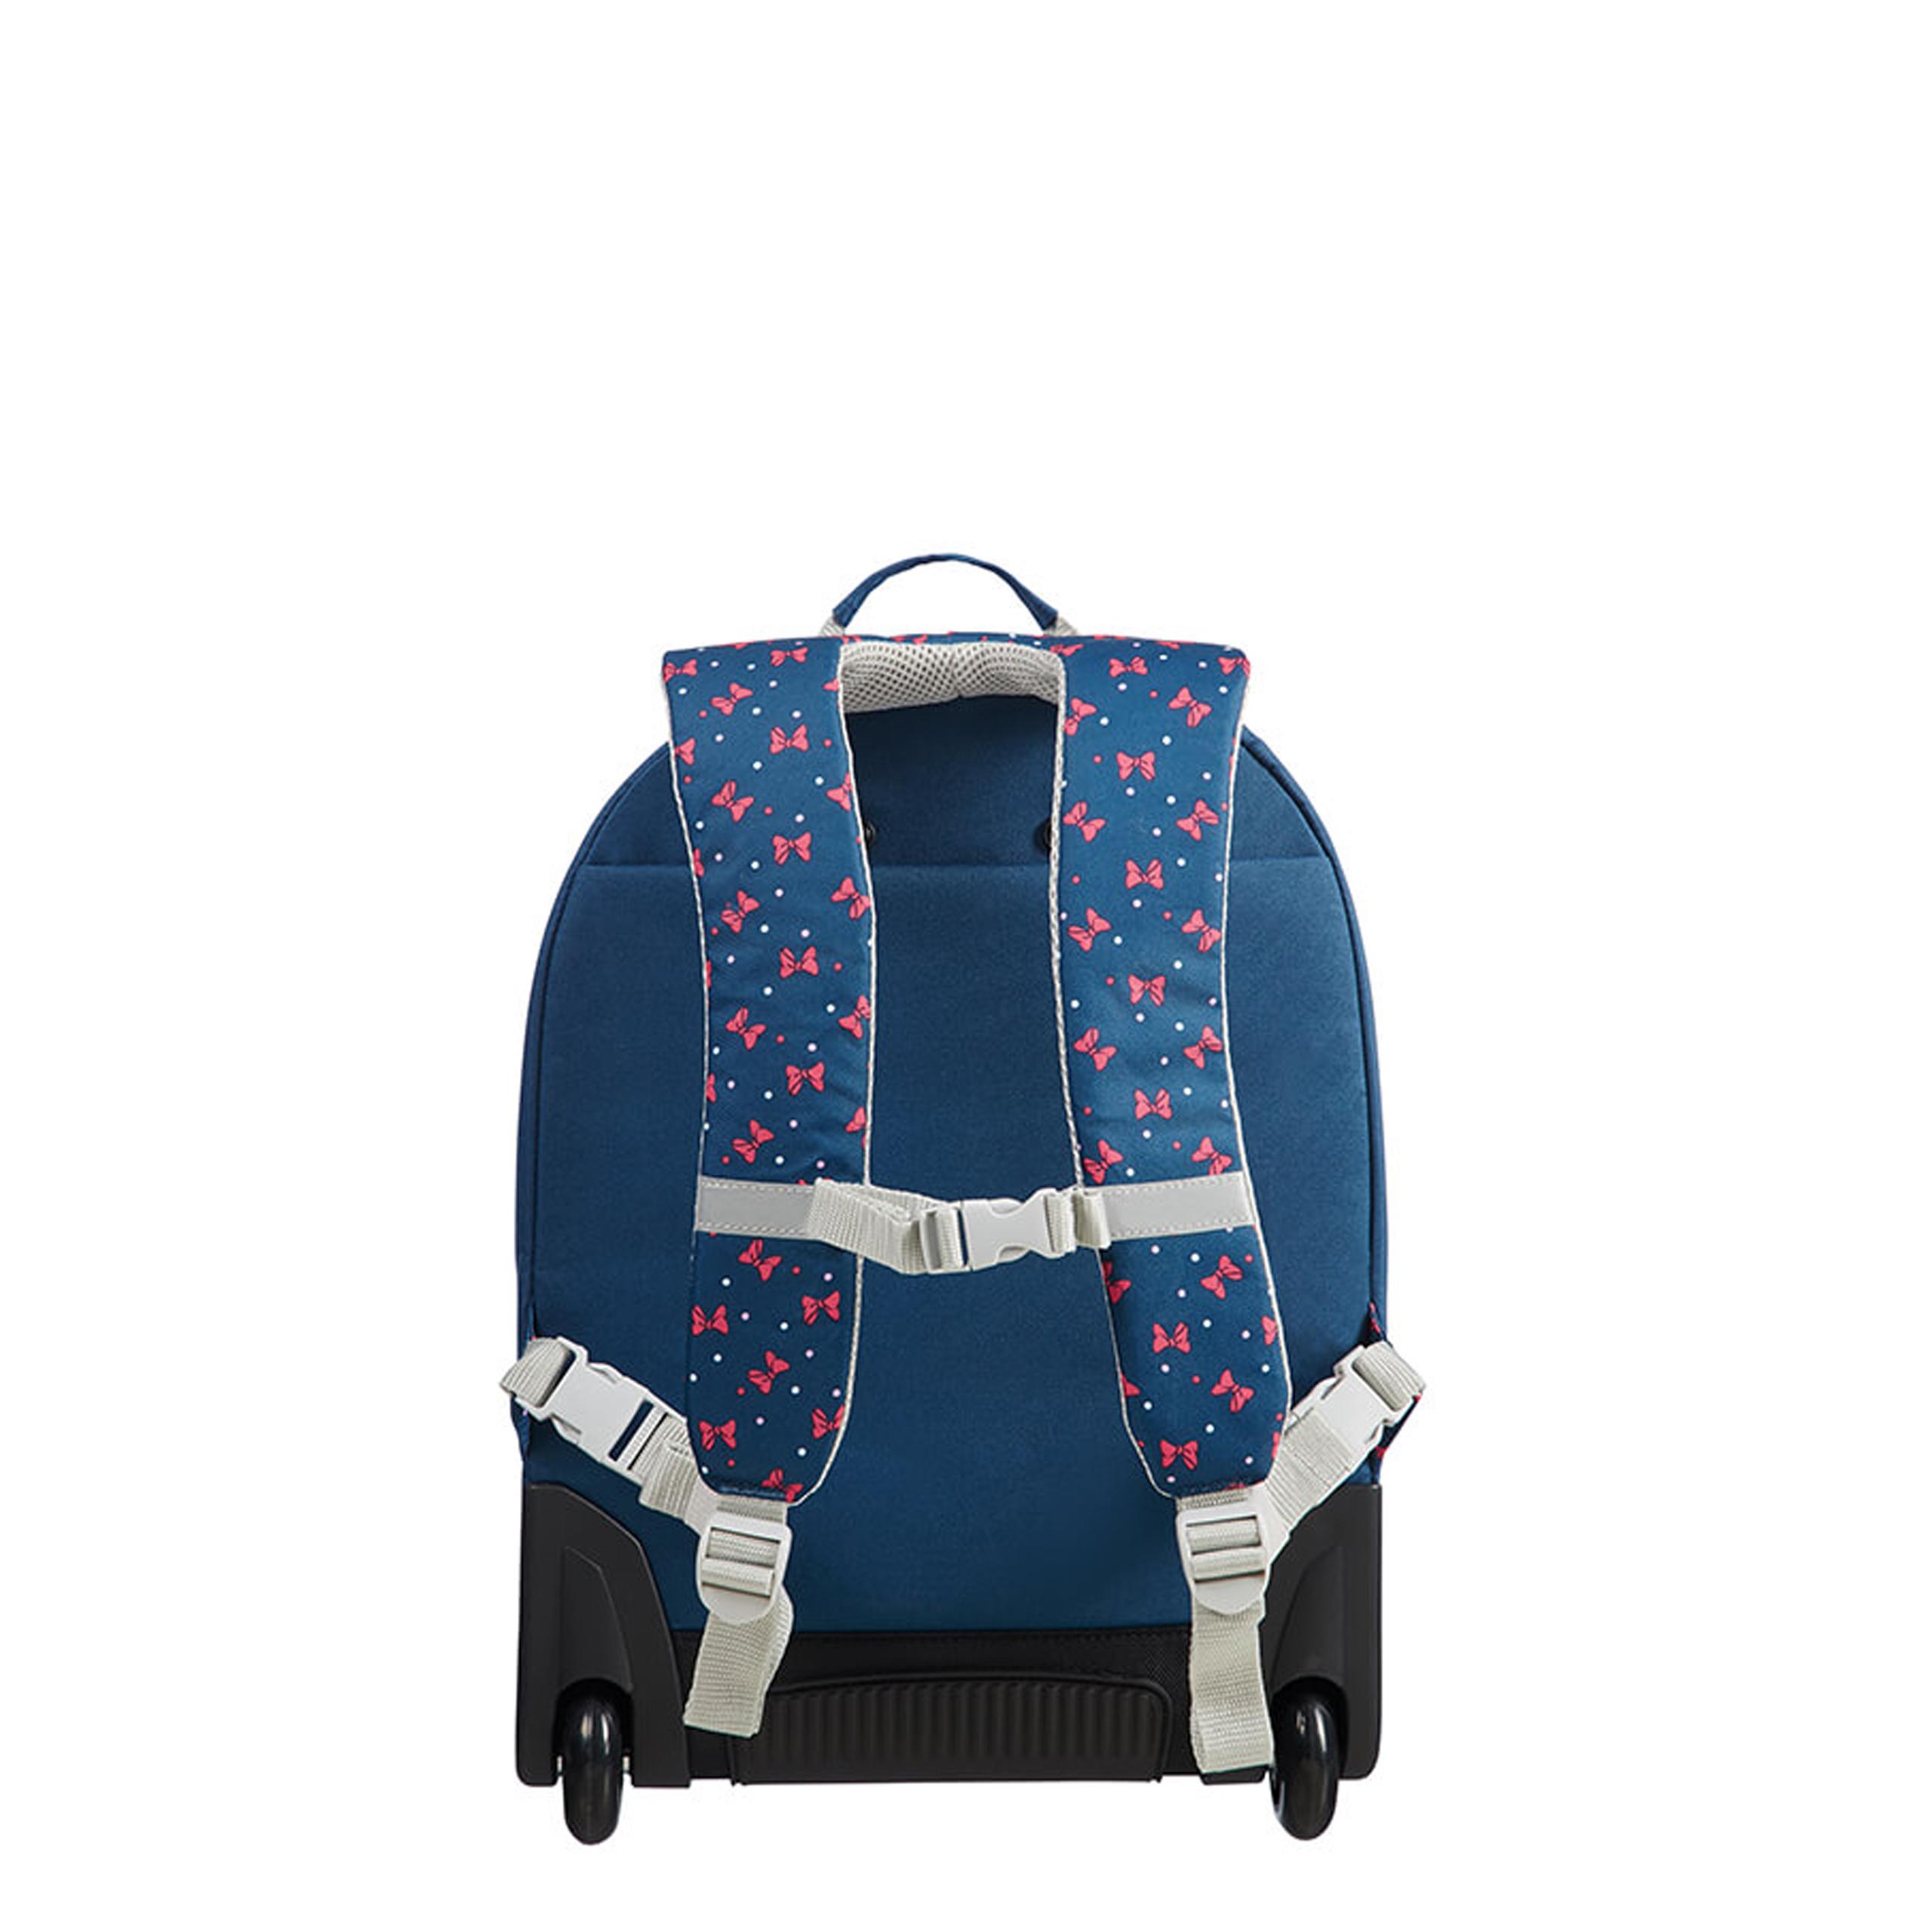 8c524f7d1bc83 New Line - Plecak na kółkach Samsonite Disney Minnie Neon 40C 01 006 ...